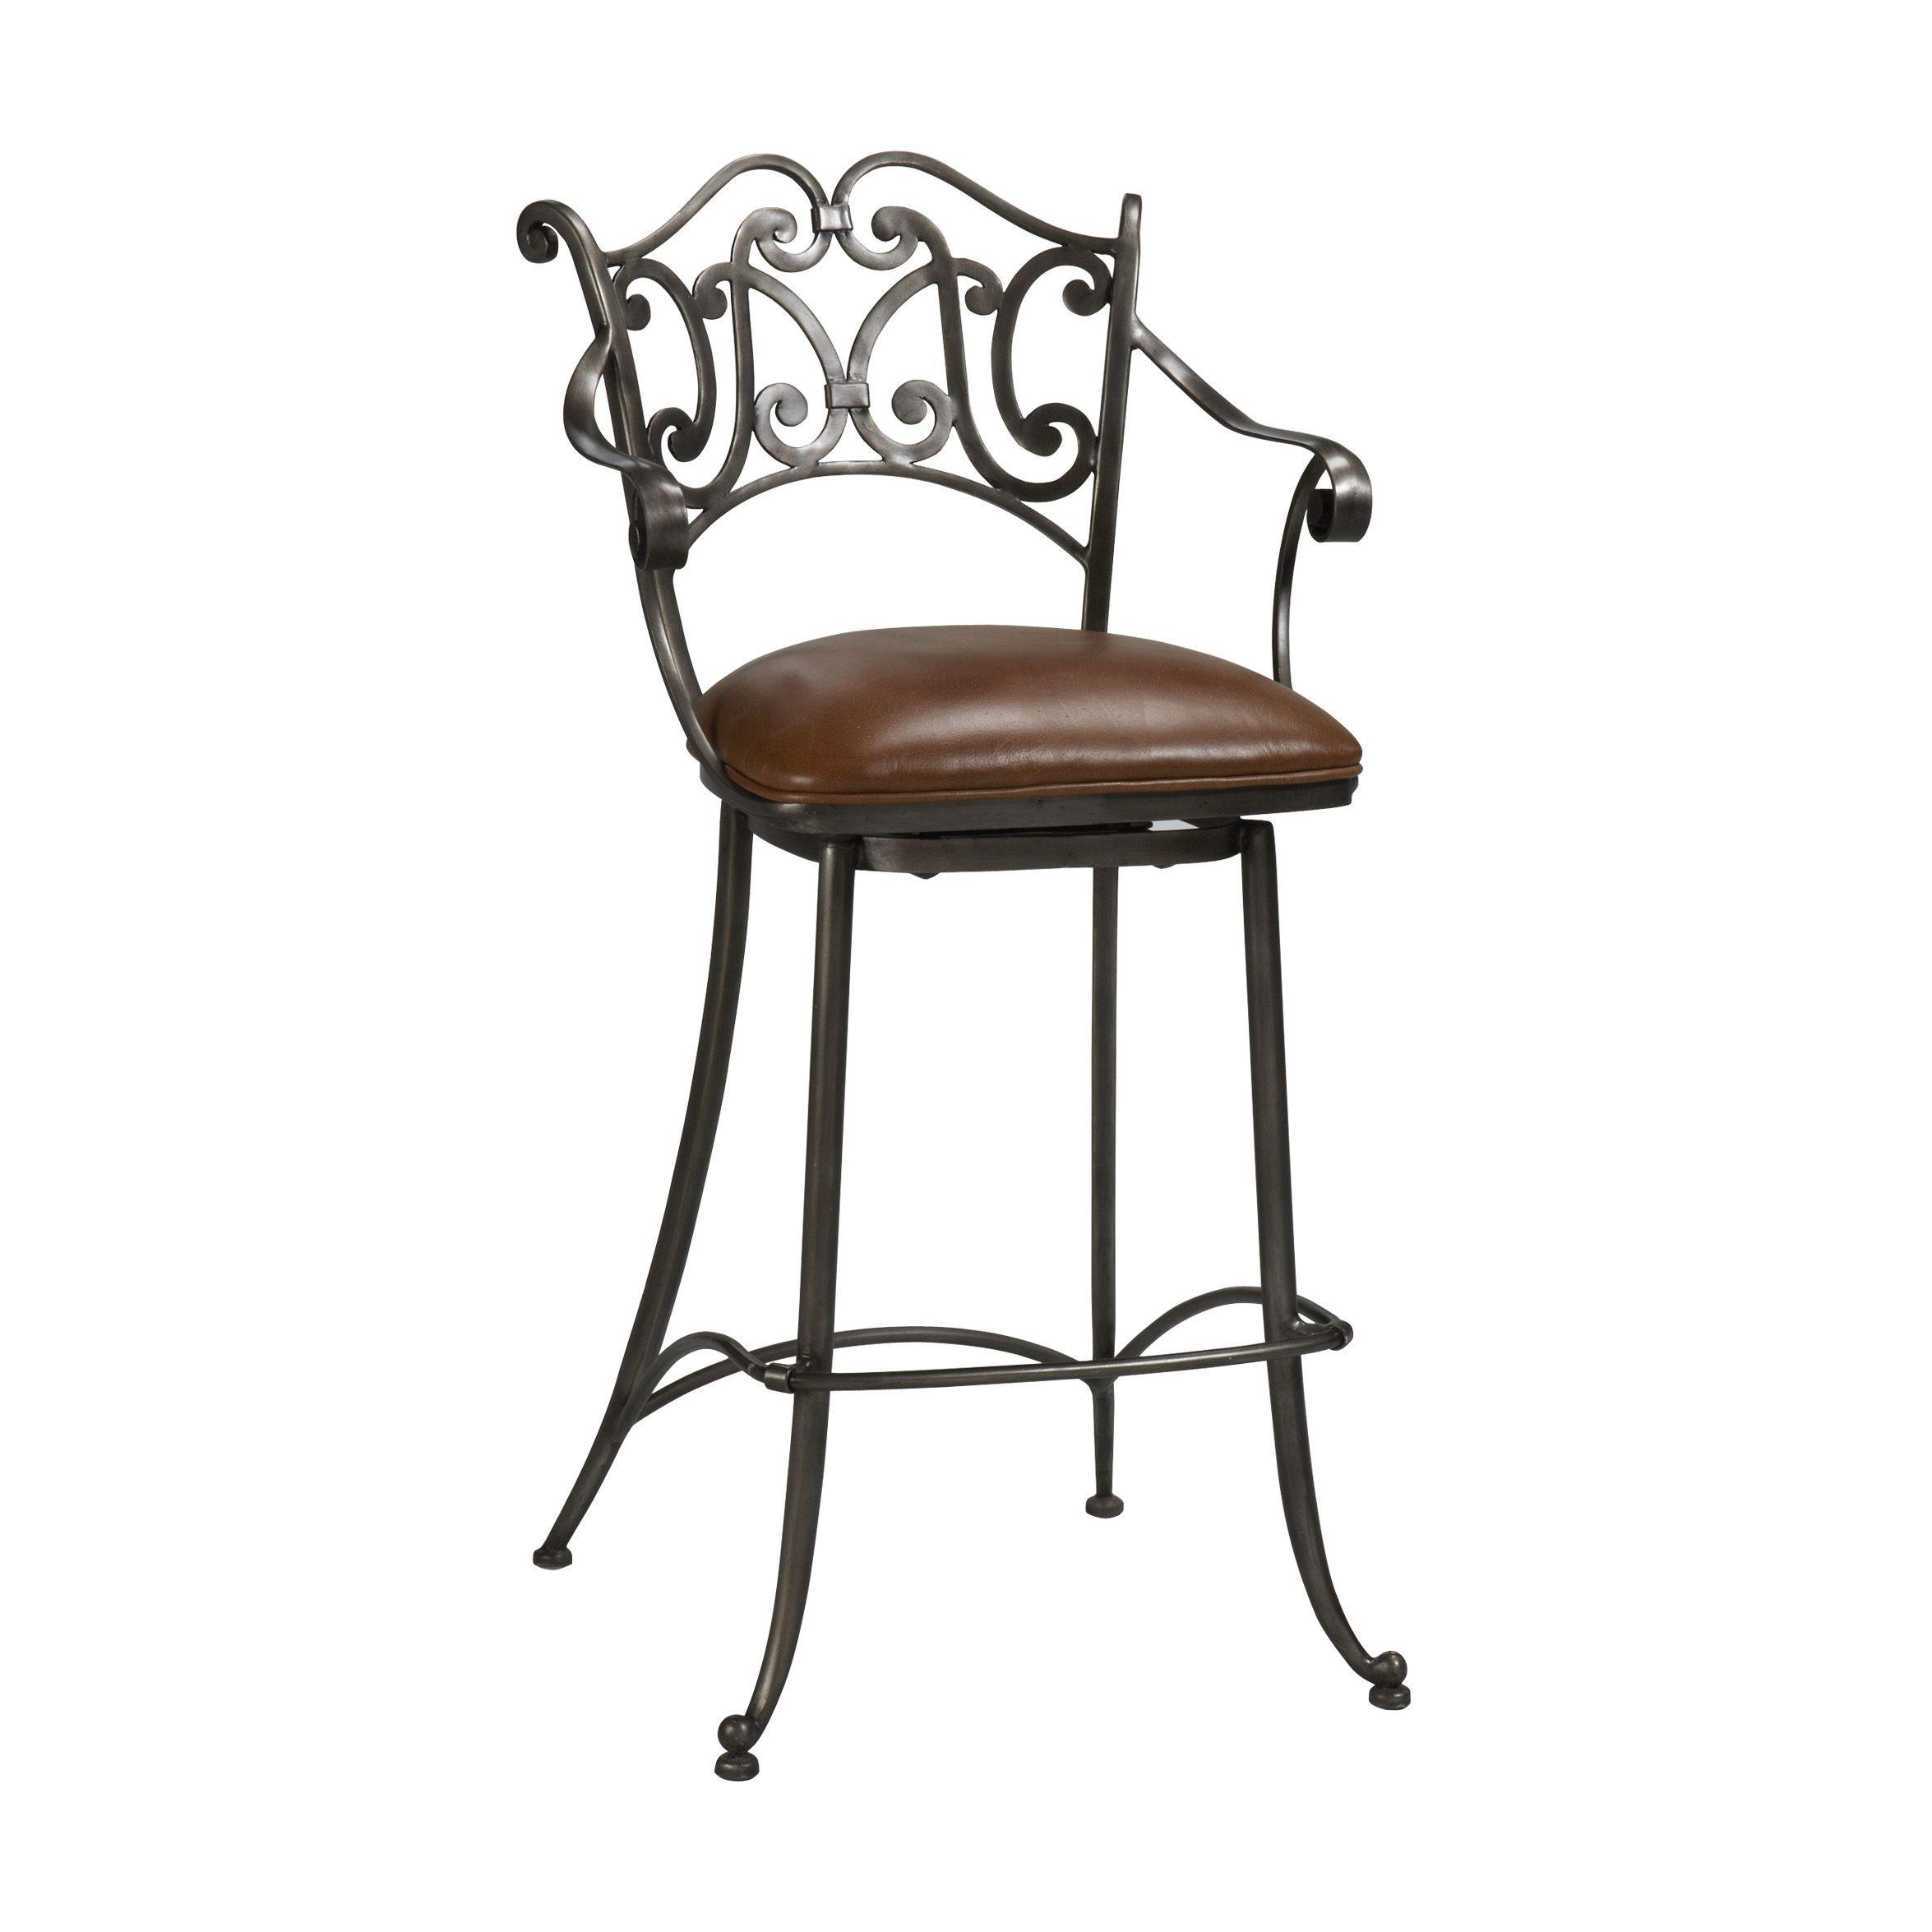 Tremendous Gaston Iron Barstool Ethan Allen Us Bar Stools Home Customarchery Wood Chair Design Ideas Customarcherynet